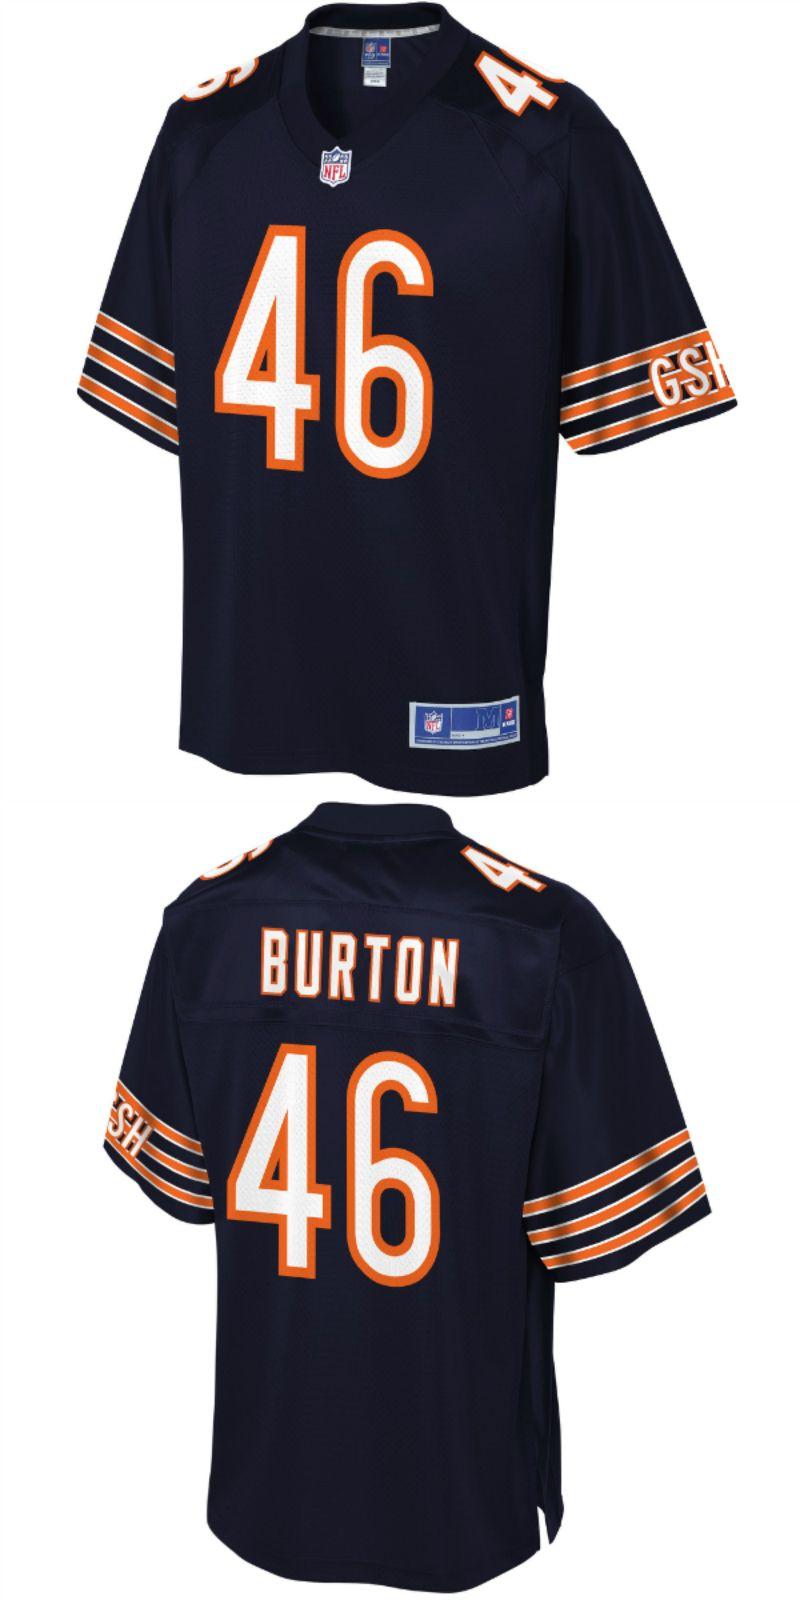 huge discount 0a837 910d9 收藏到NFL Chicago Bears jersey